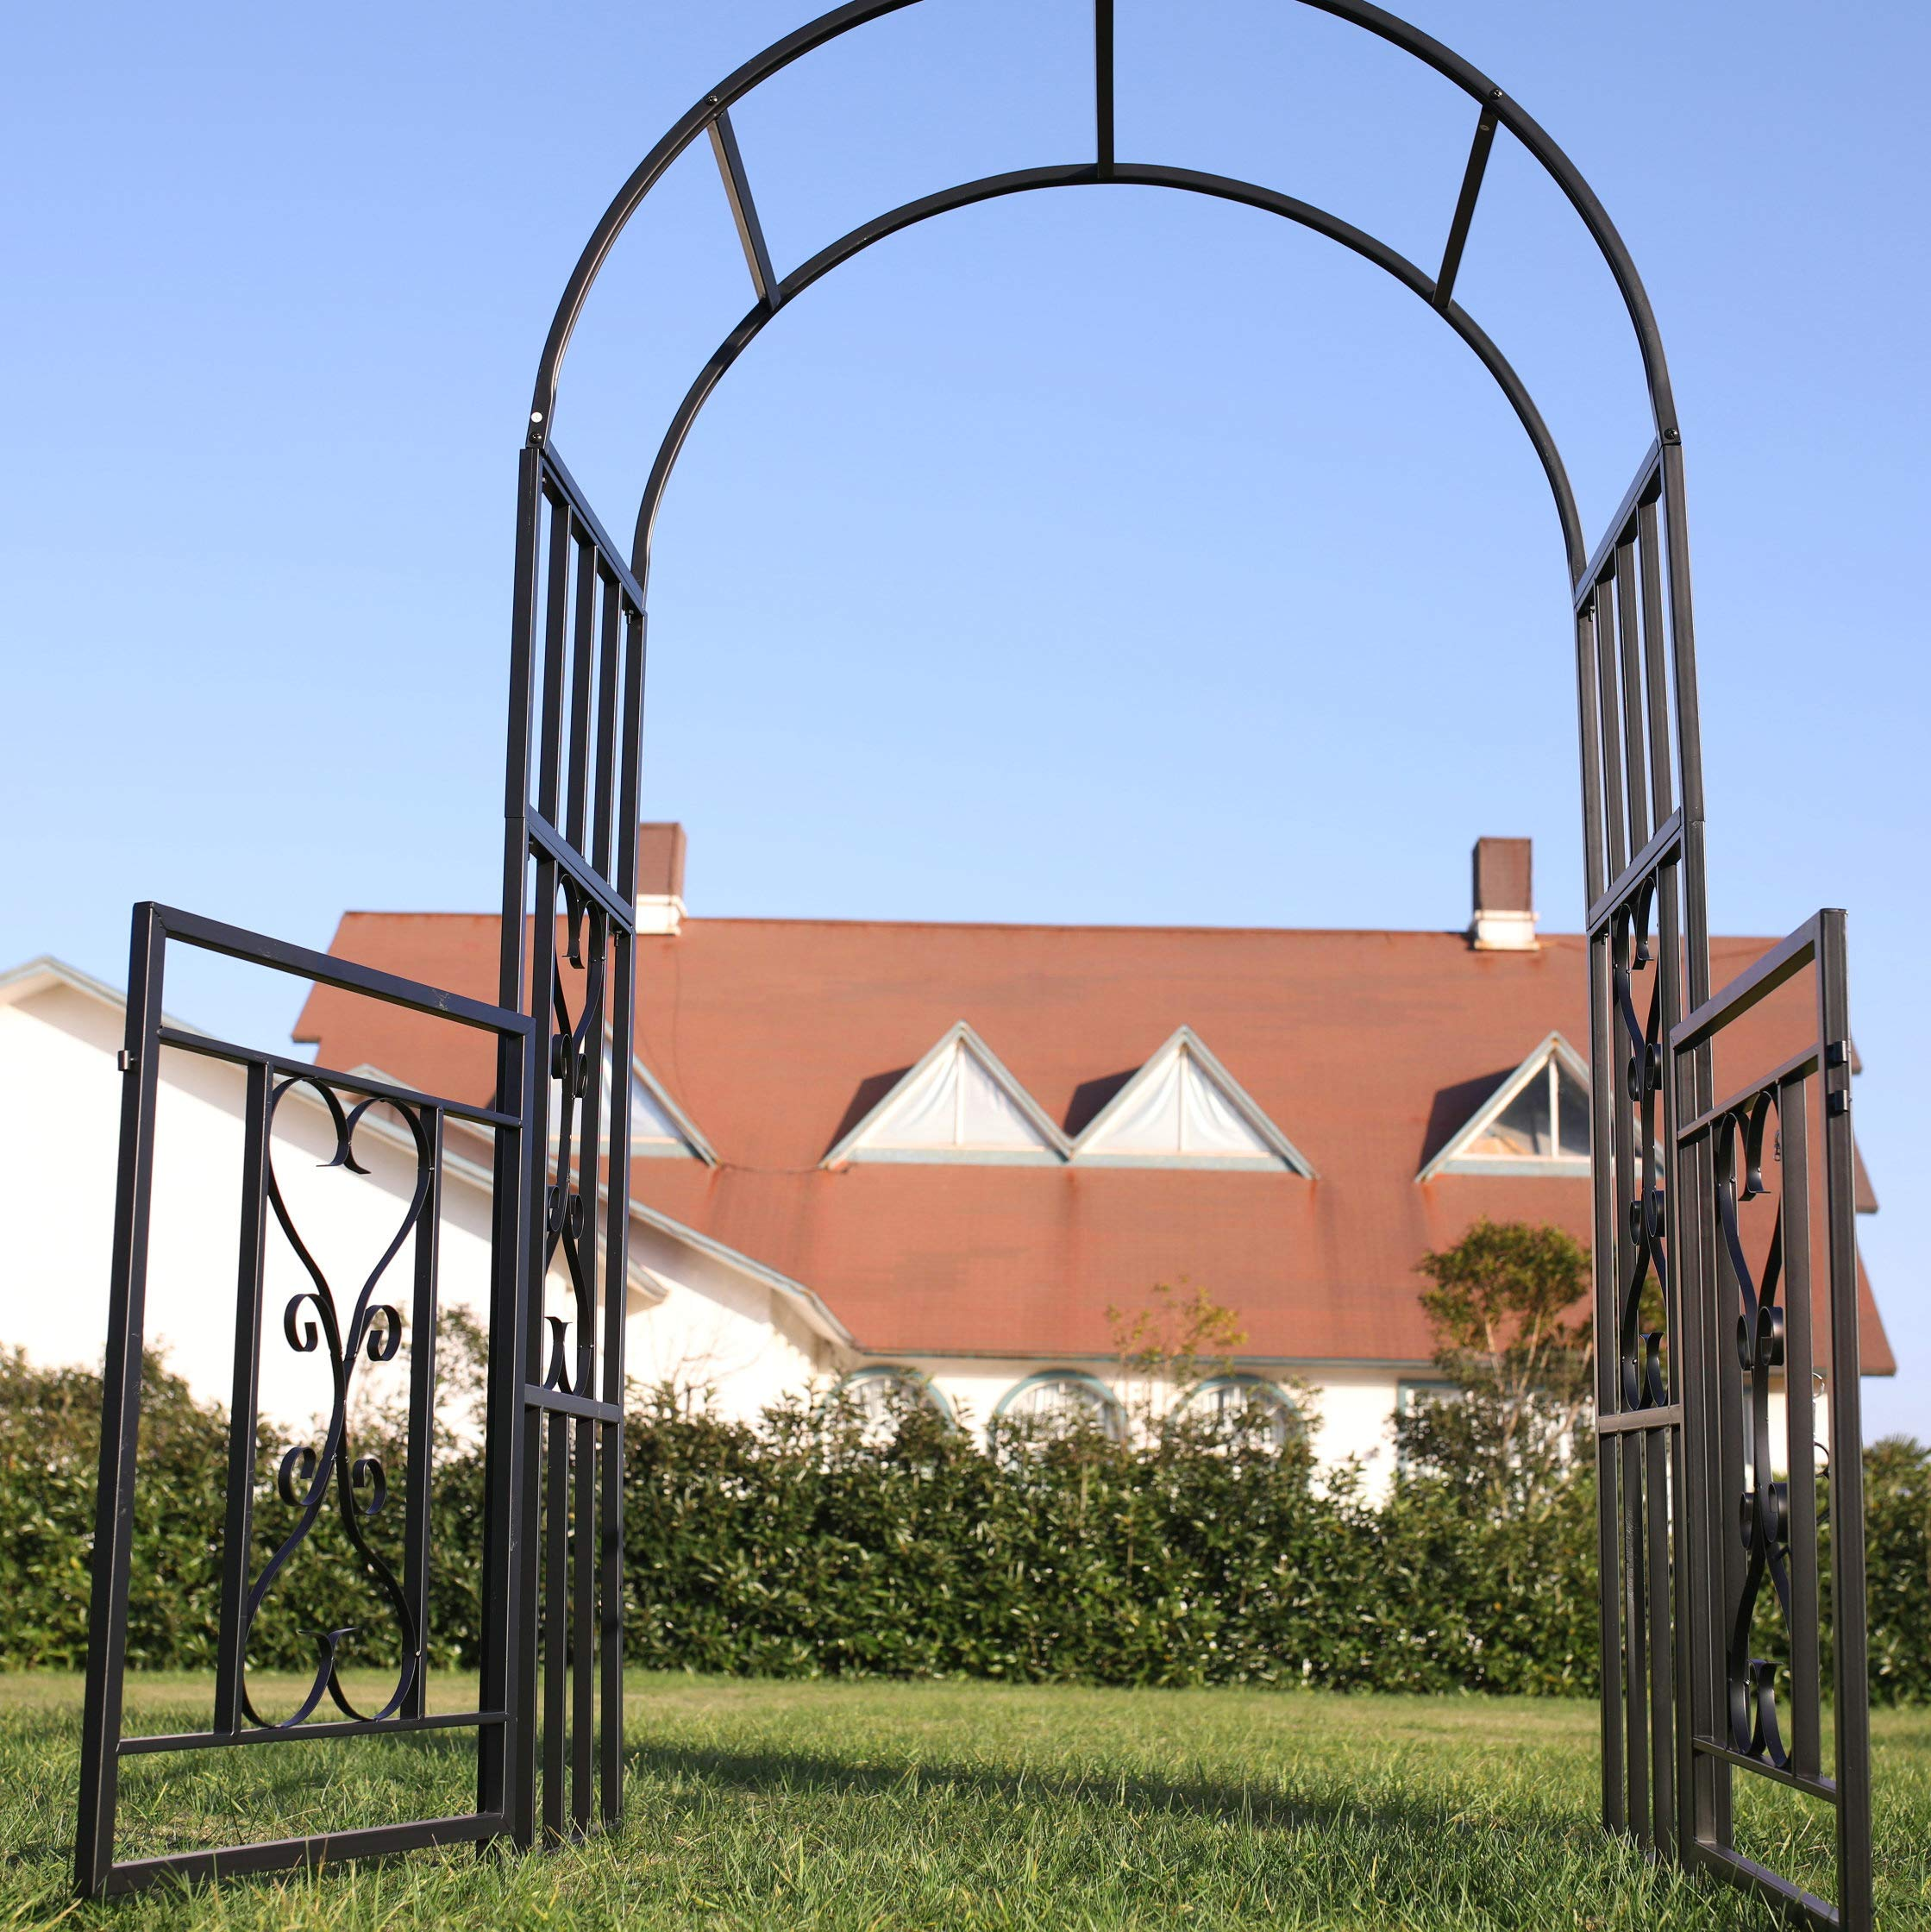 1. GO Steel Garden Arch with Gate, 6'7'' High x 3'7'' Wide, Garden Arbor for Various Climbing Plant, Outdoor Garden Lawn Backyard by 1. GO (Image #5)